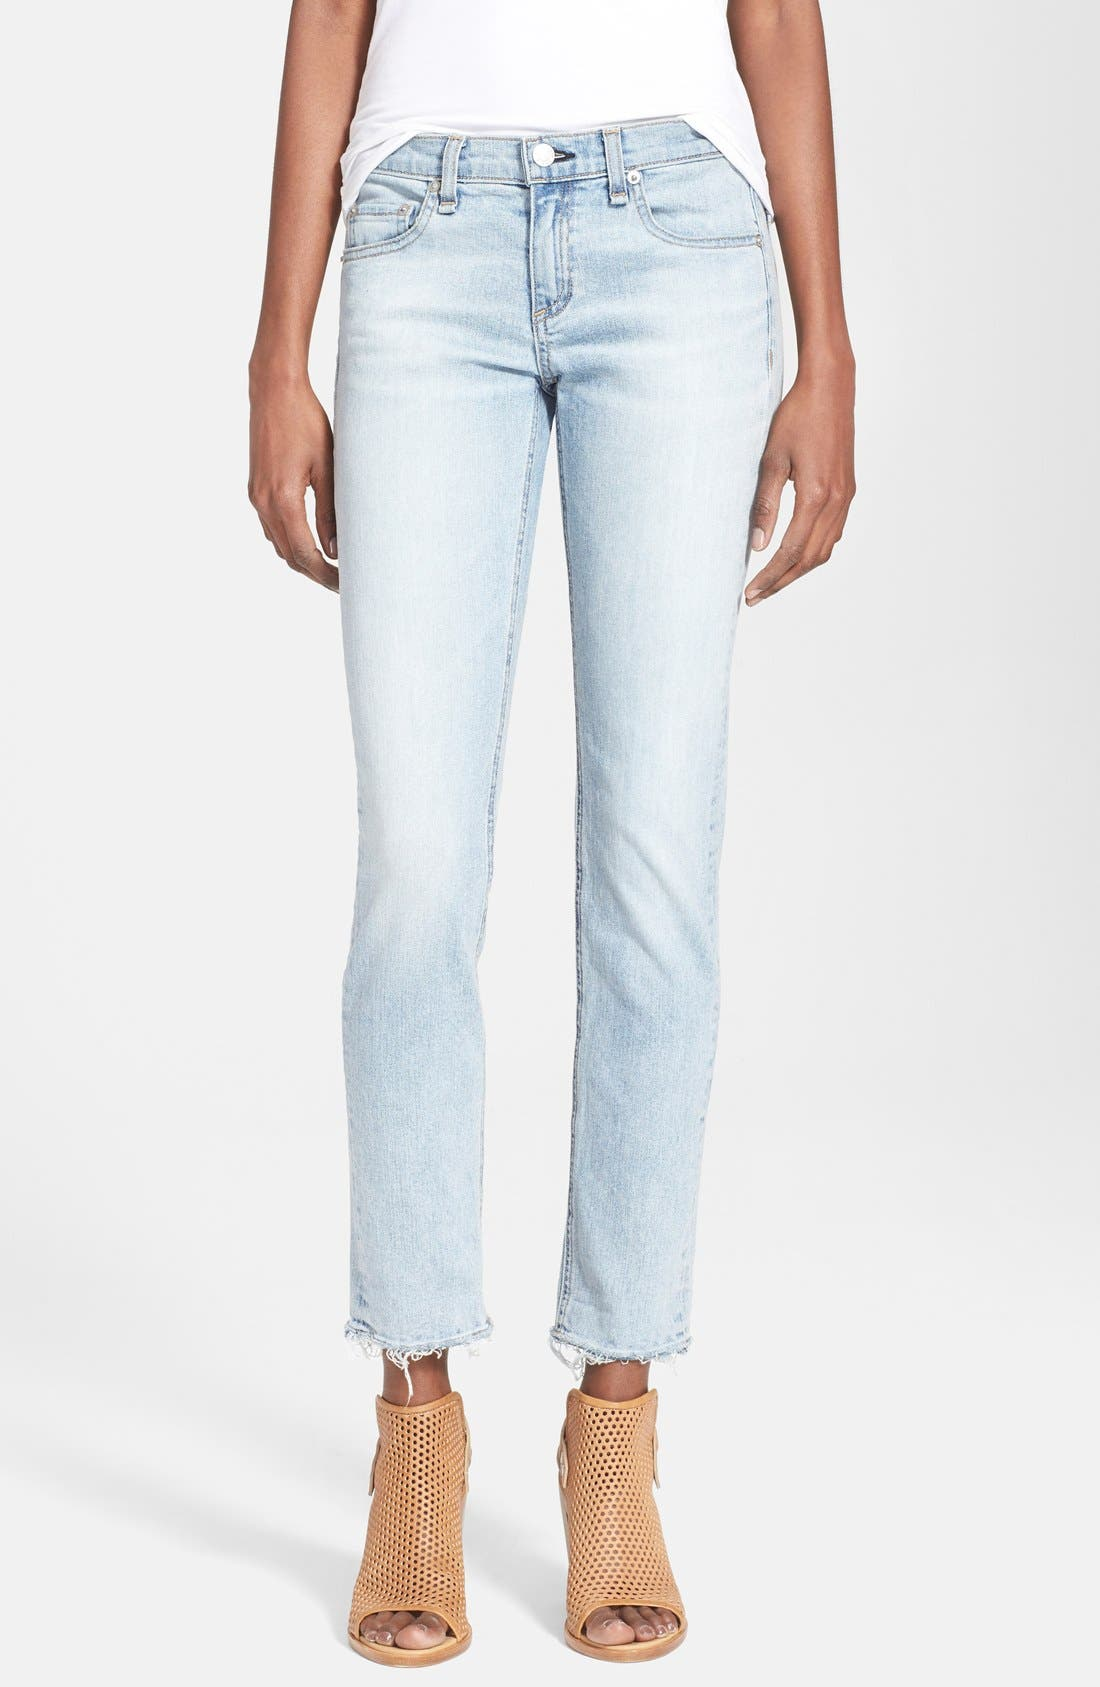 RAG & BONE,                             JEAN 'Dre' Frayed Hem Ankle Jeans,                             Main thumbnail 1, color,                             456